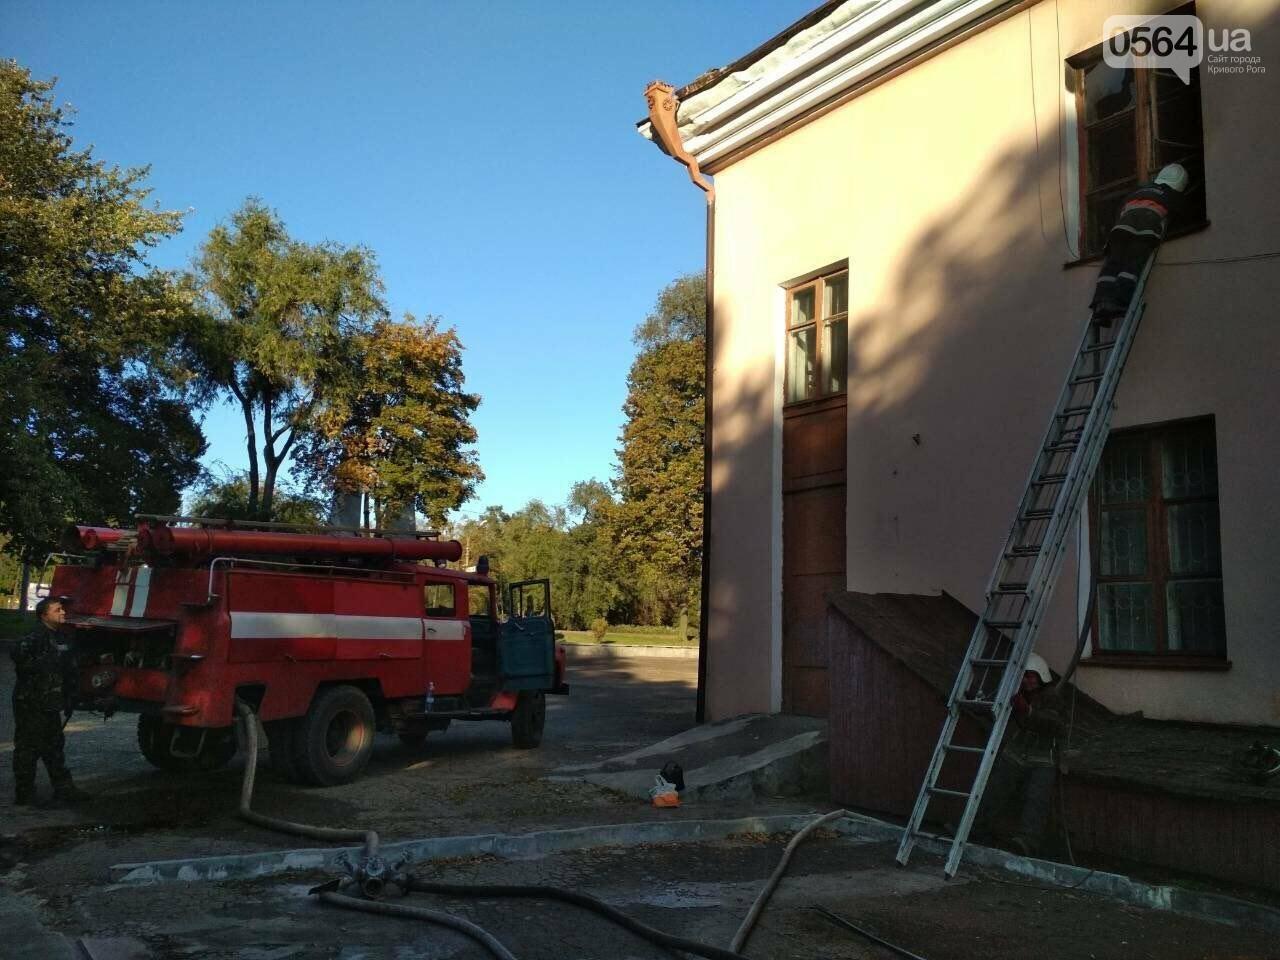 В Кривом Роге на пожаре в здании ДК погиб мужчина, - ФОТО , фото-5